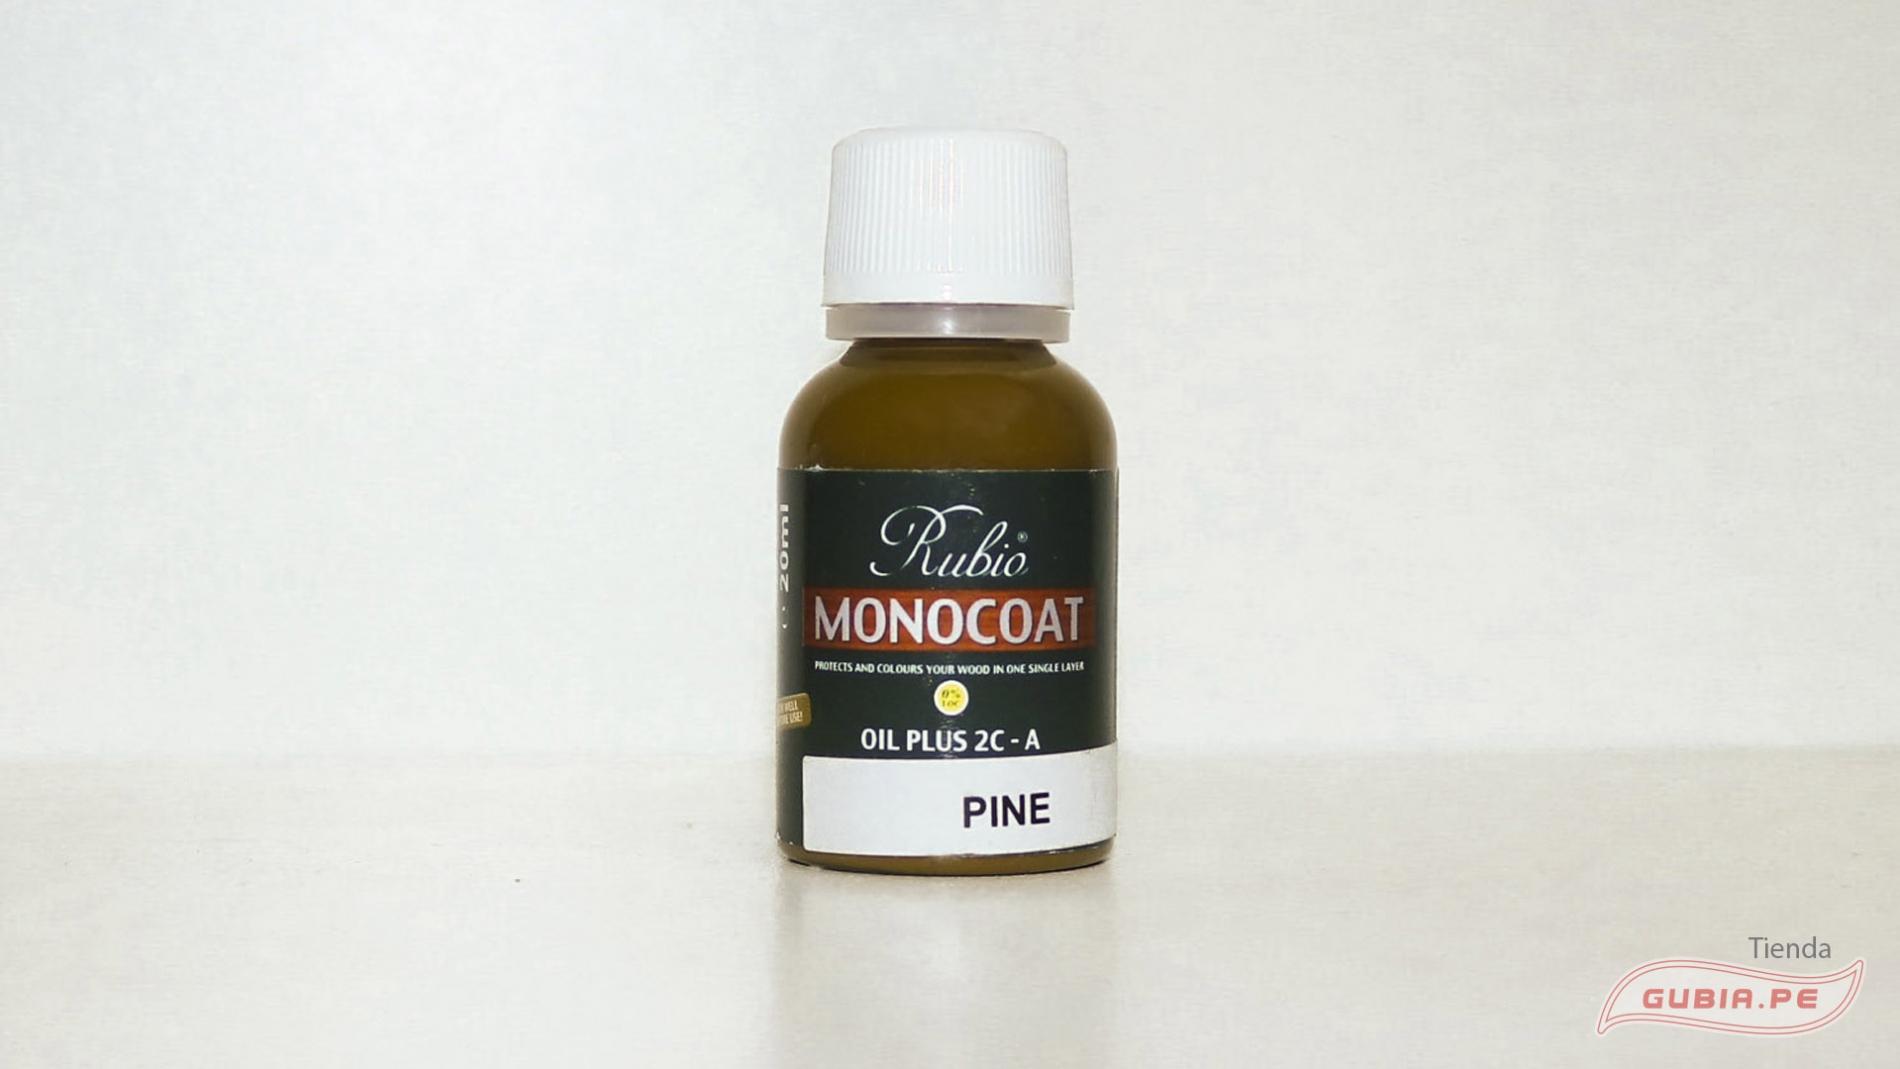 5410761168799-Pine Oil Plus 2C-A ( 20 ml ) RMC-max-1.